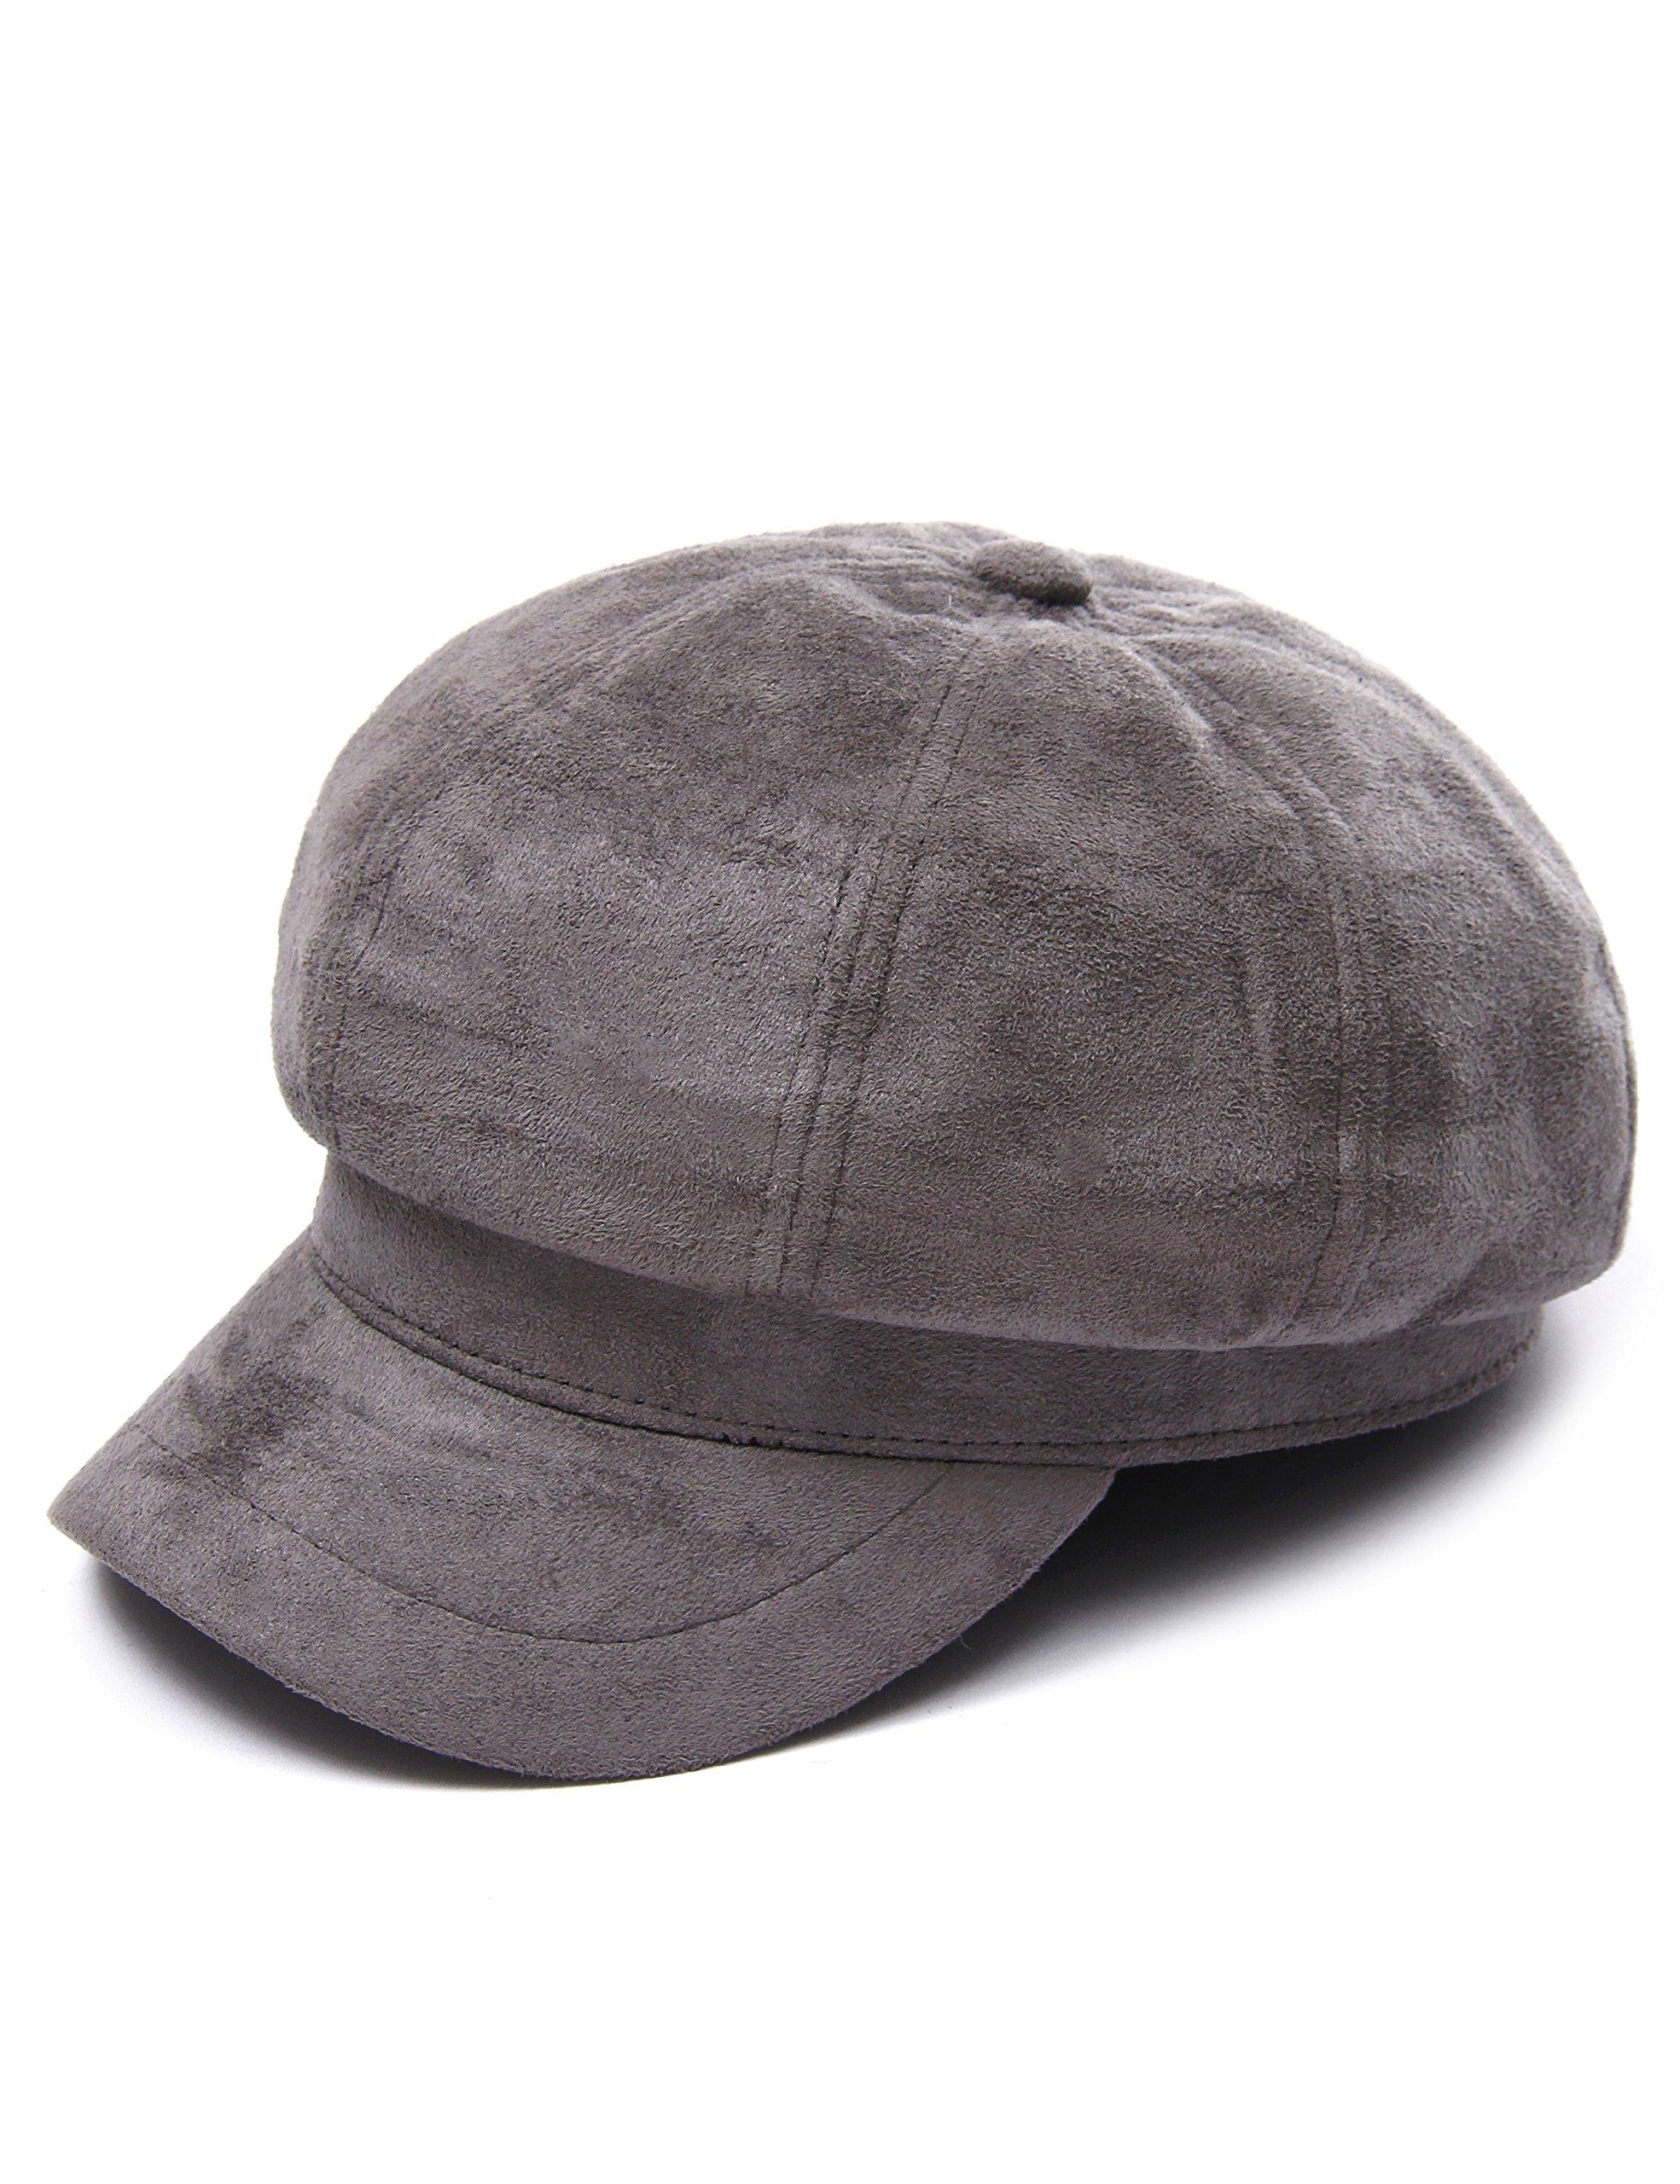 Santiagoana Women Corduroy,Cotton Newsboy Cap Cabbie Painter Beret Cloche Cotton Visor Hats (Grey) by Santiagoana (Image #2)